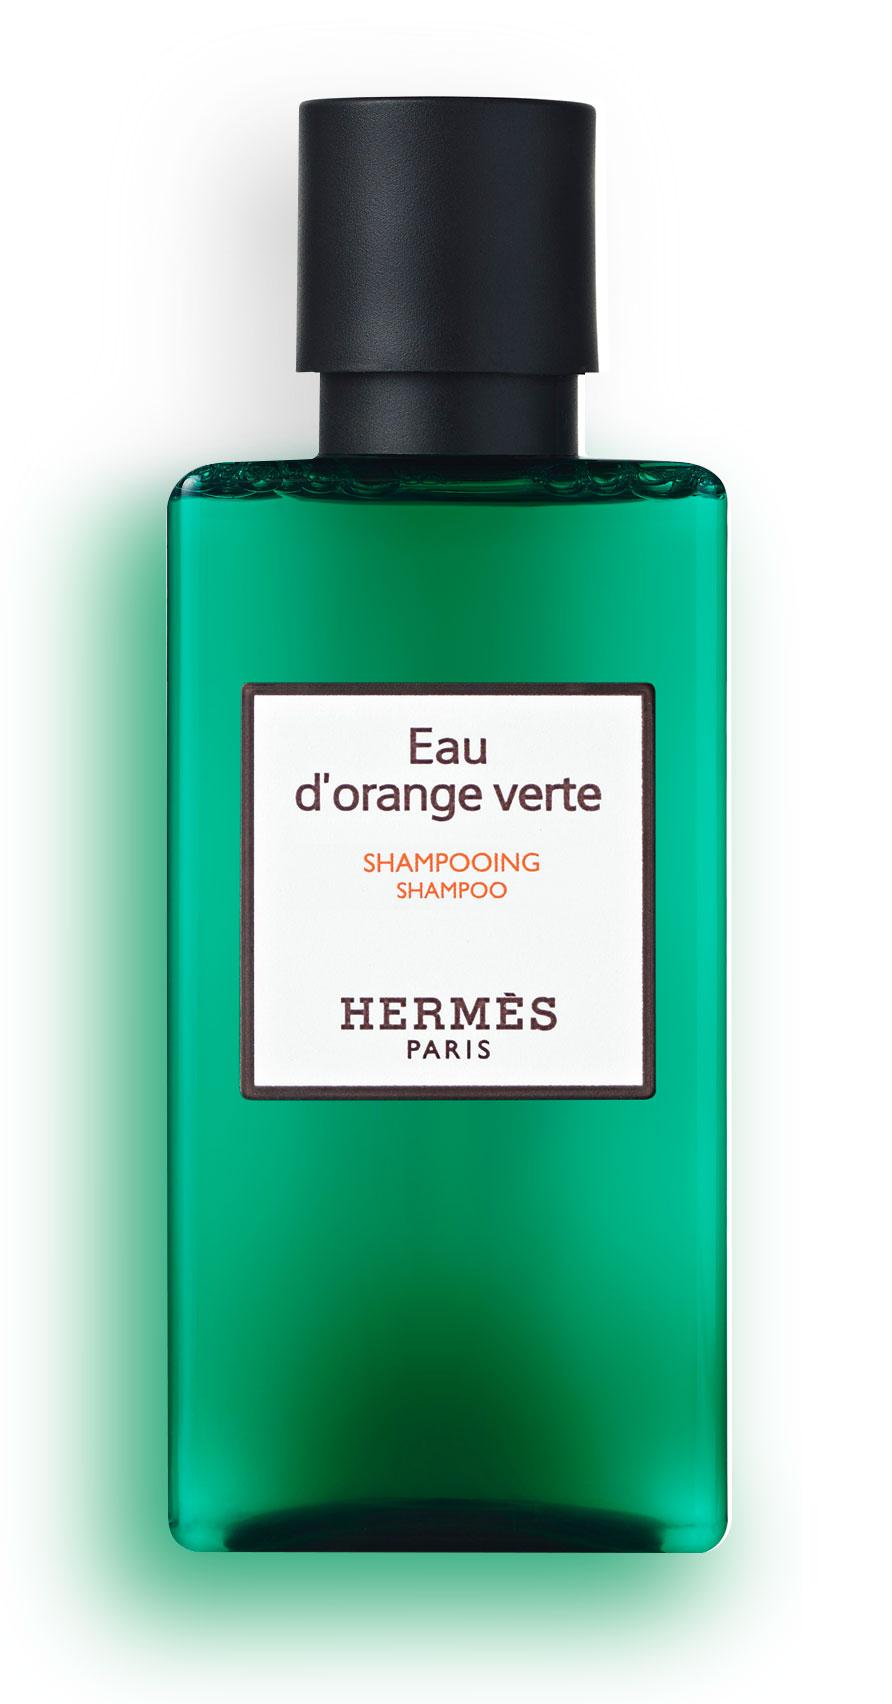 Hermès - Eau d'orange verte - Shampooing 40 ml.